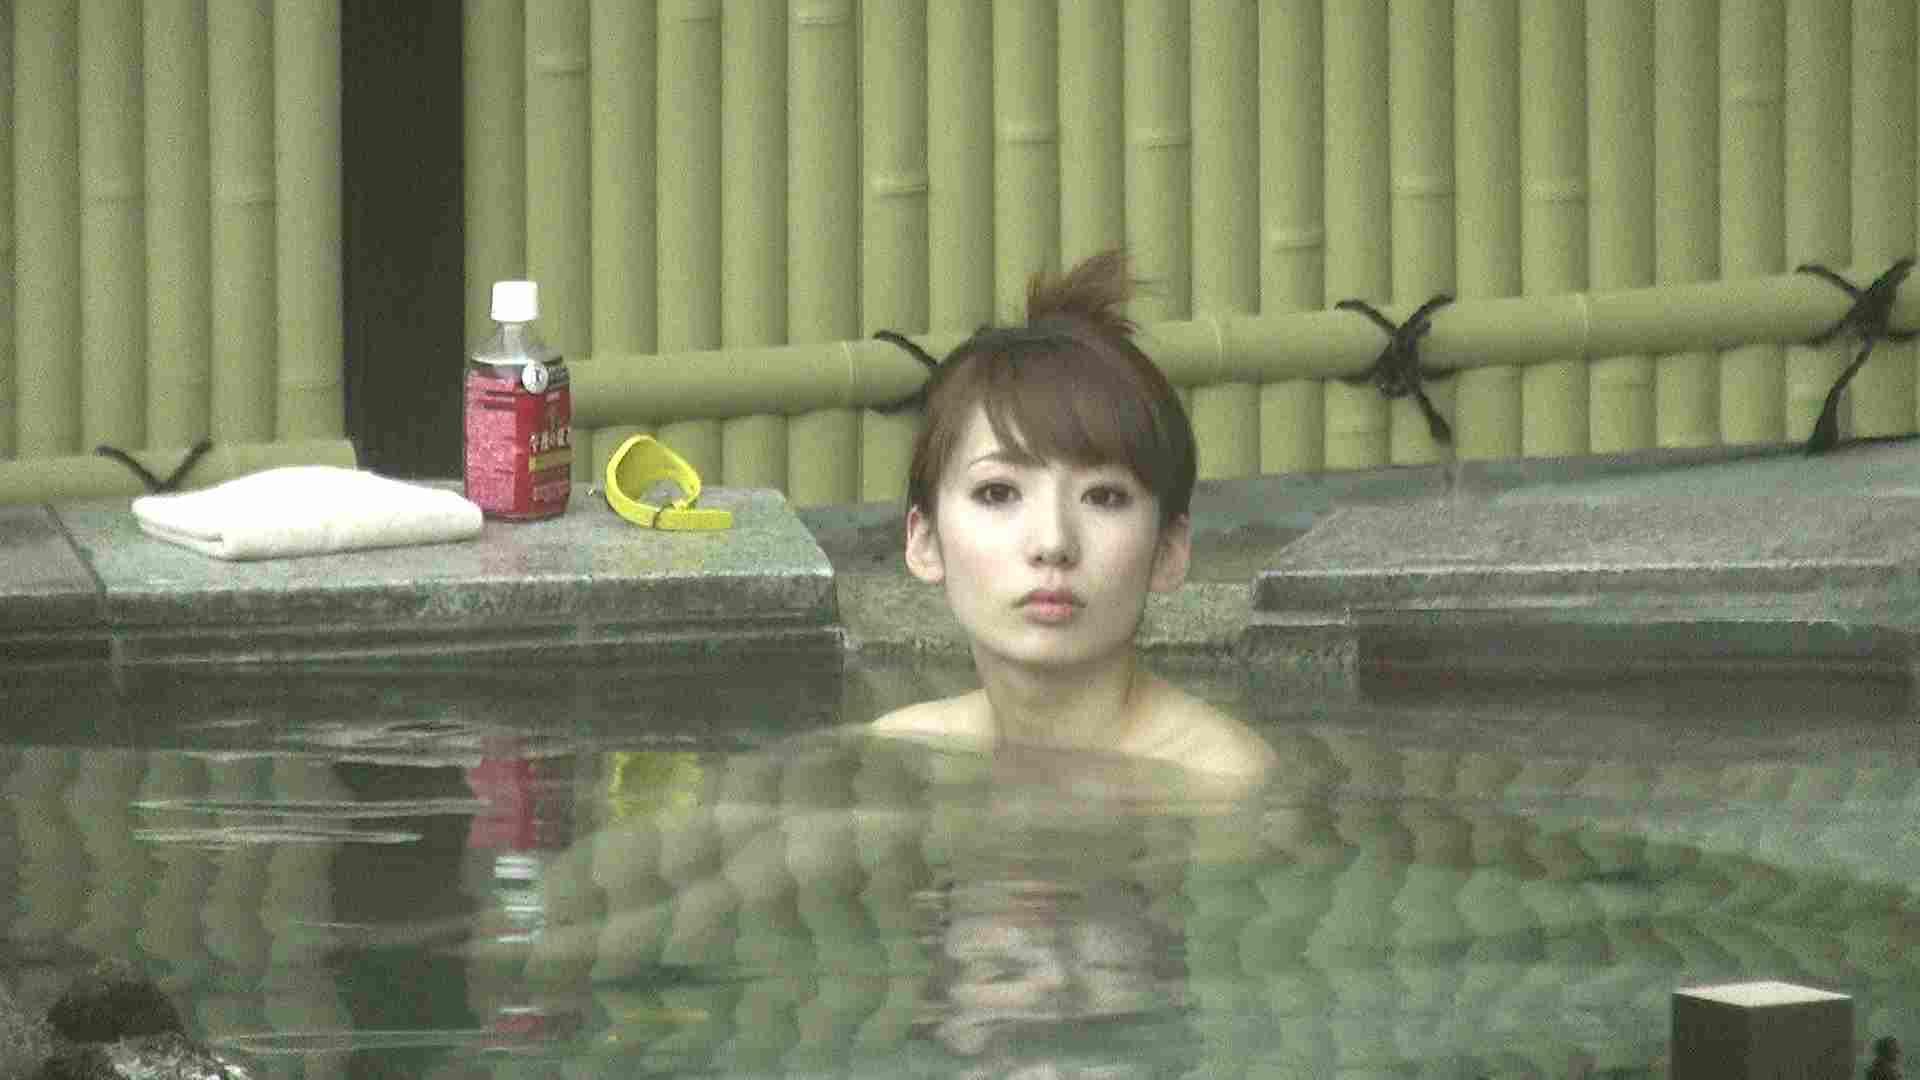 Aquaな露天風呂Vol.208 HなOL   盗撮  101pic 31